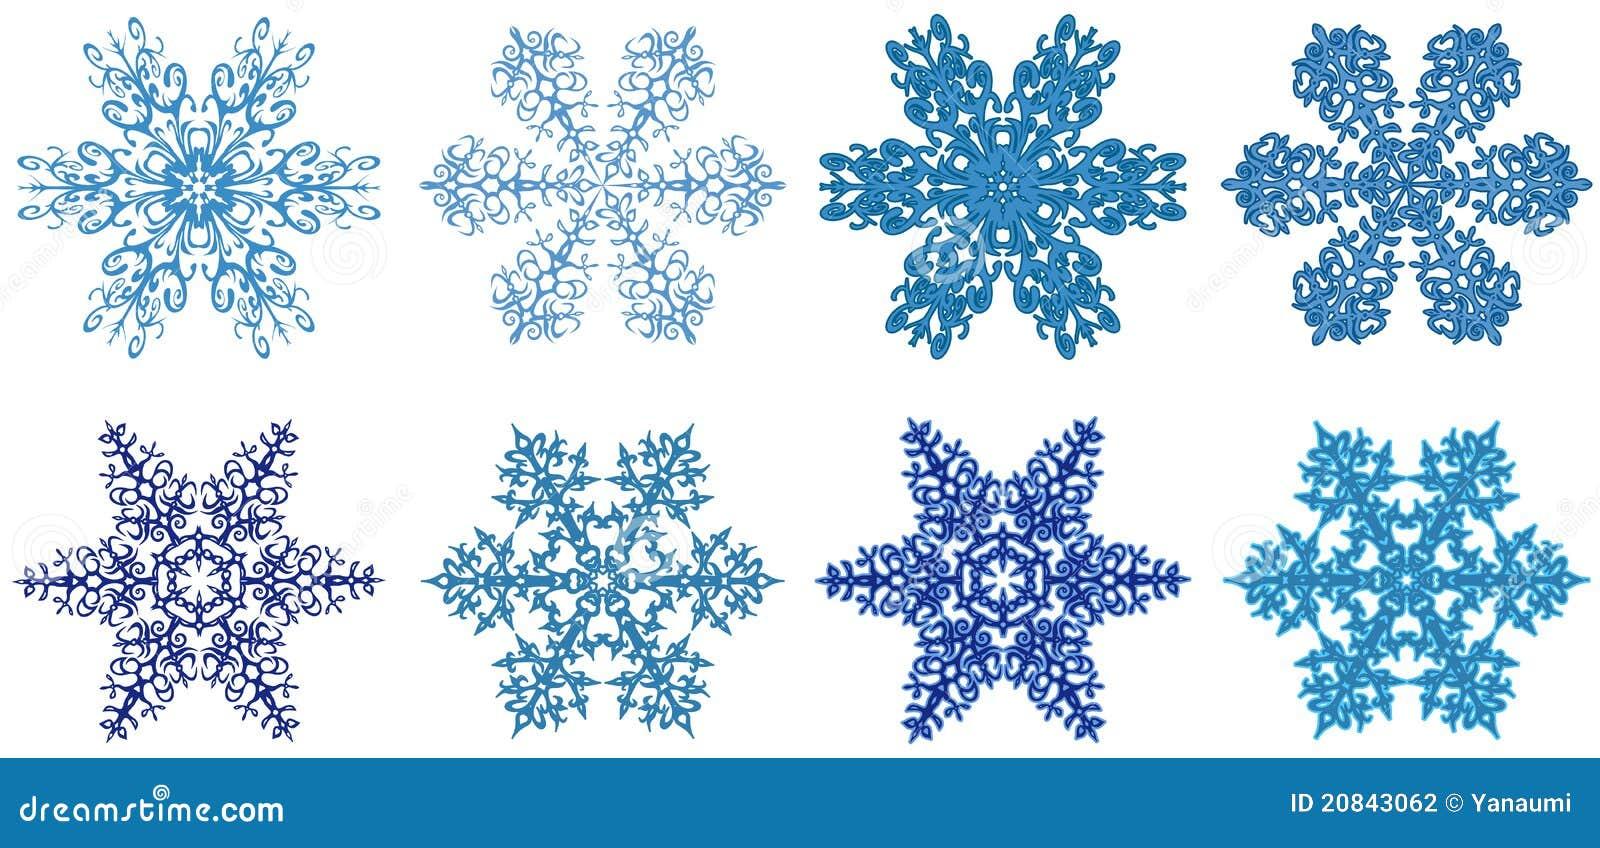 Clipart Christmas Snowflakes